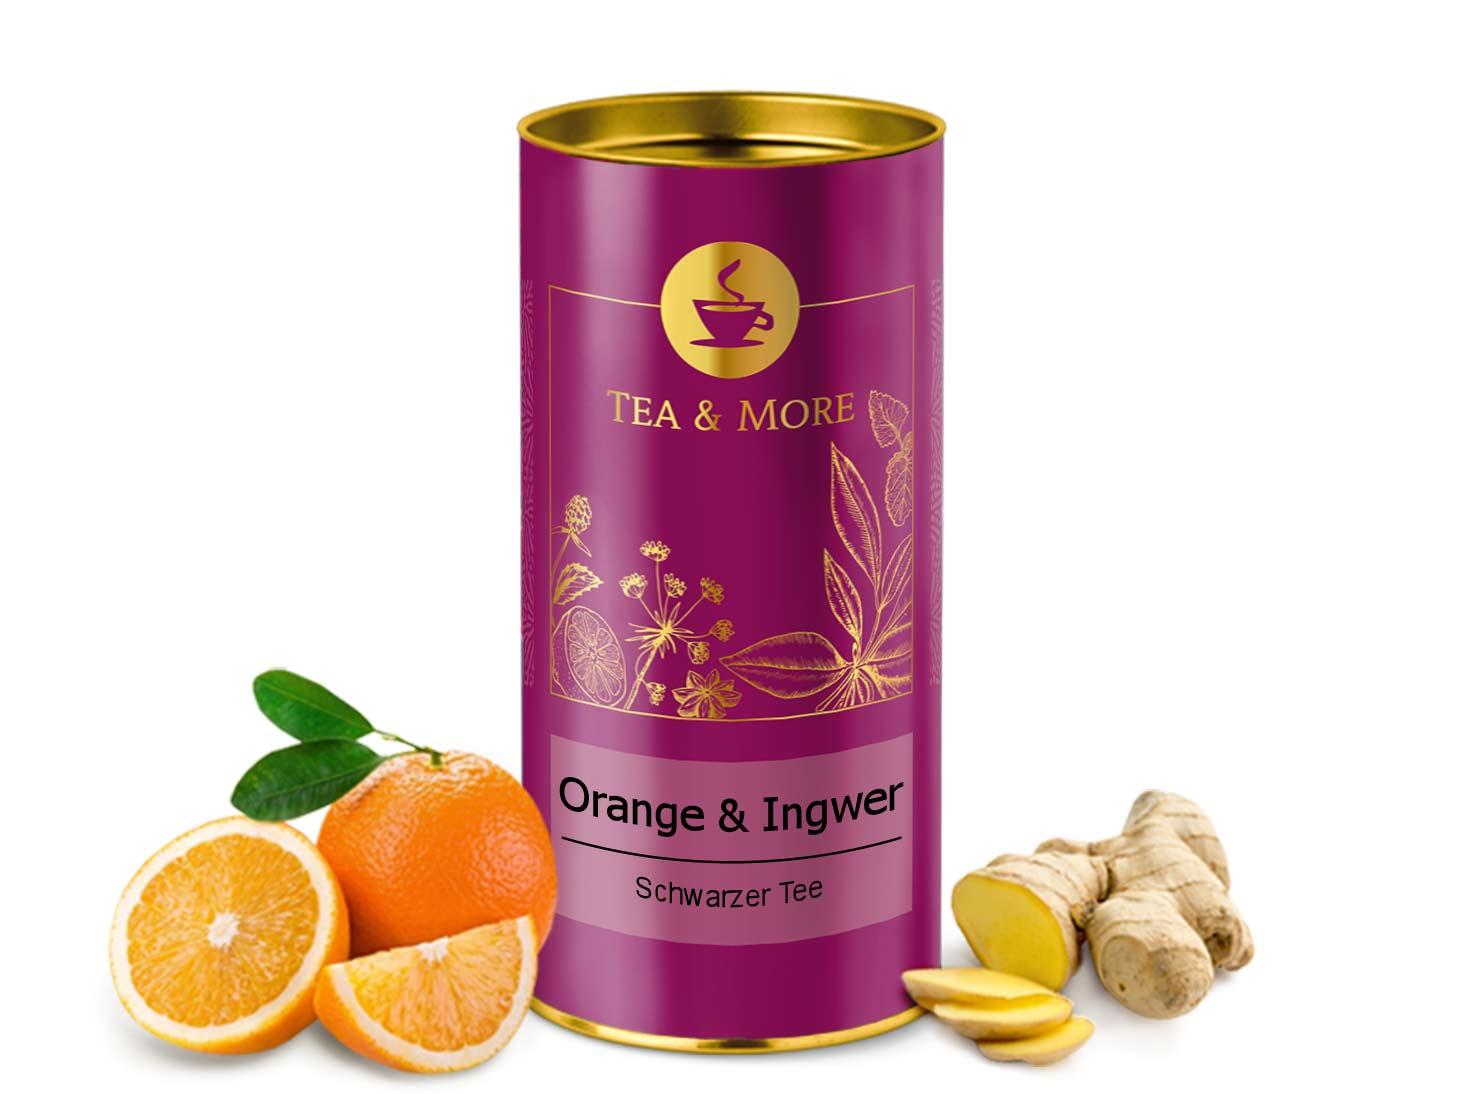 Orange & Ingwer